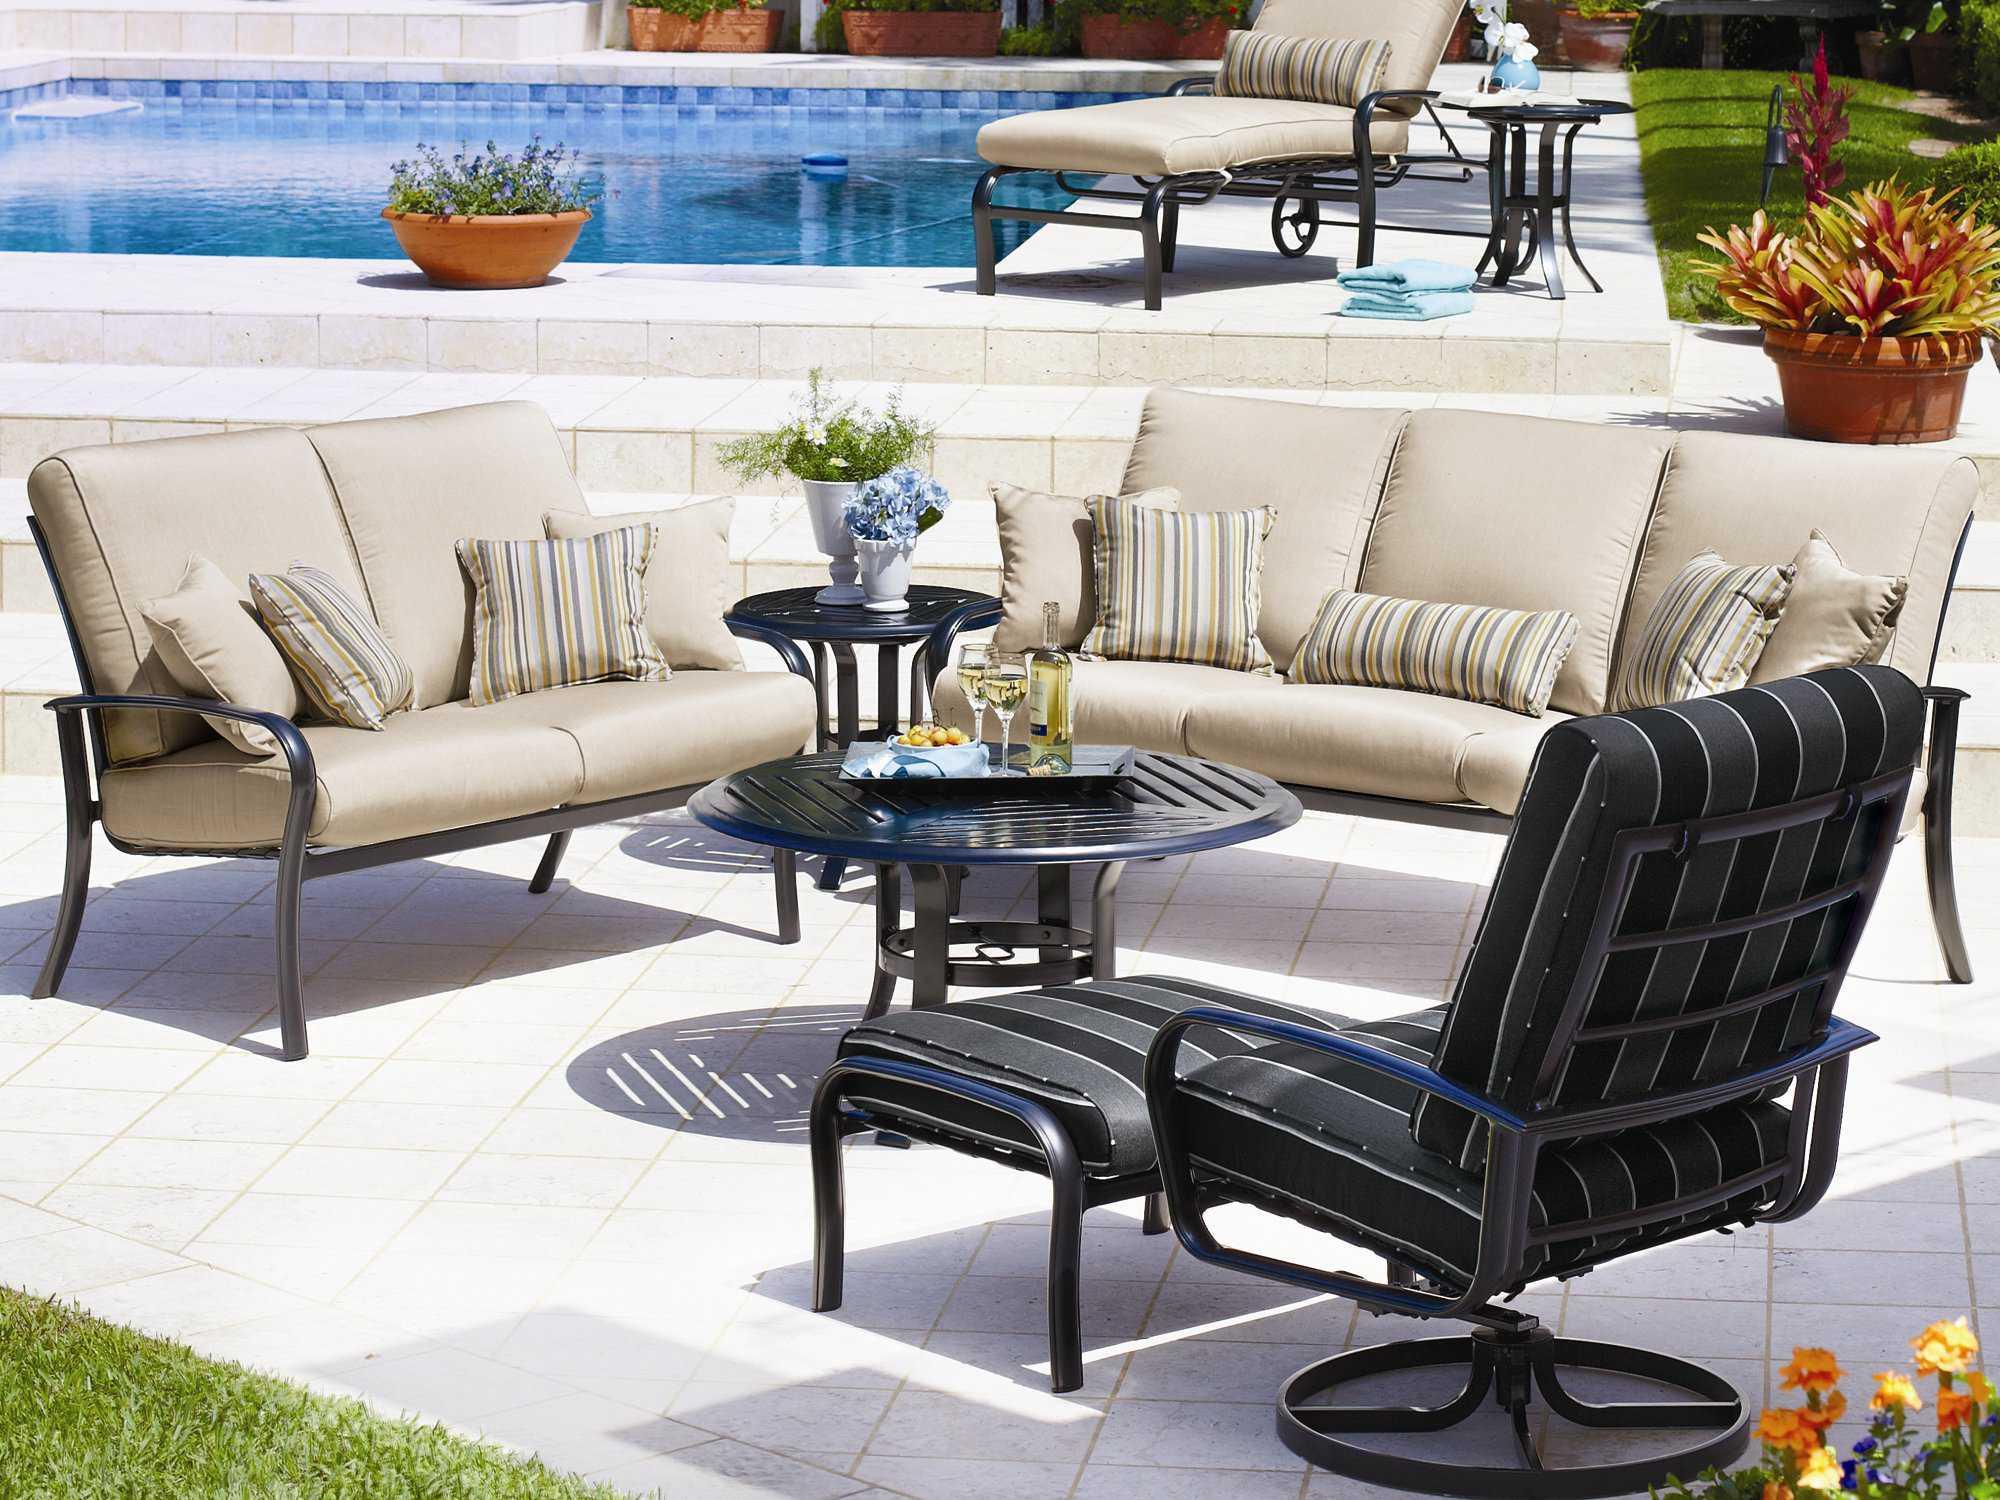 spotlight outdoor chair covers variable furniture balans the original kneeling winston savoy cushion aluminum arm ultra swivel tilt